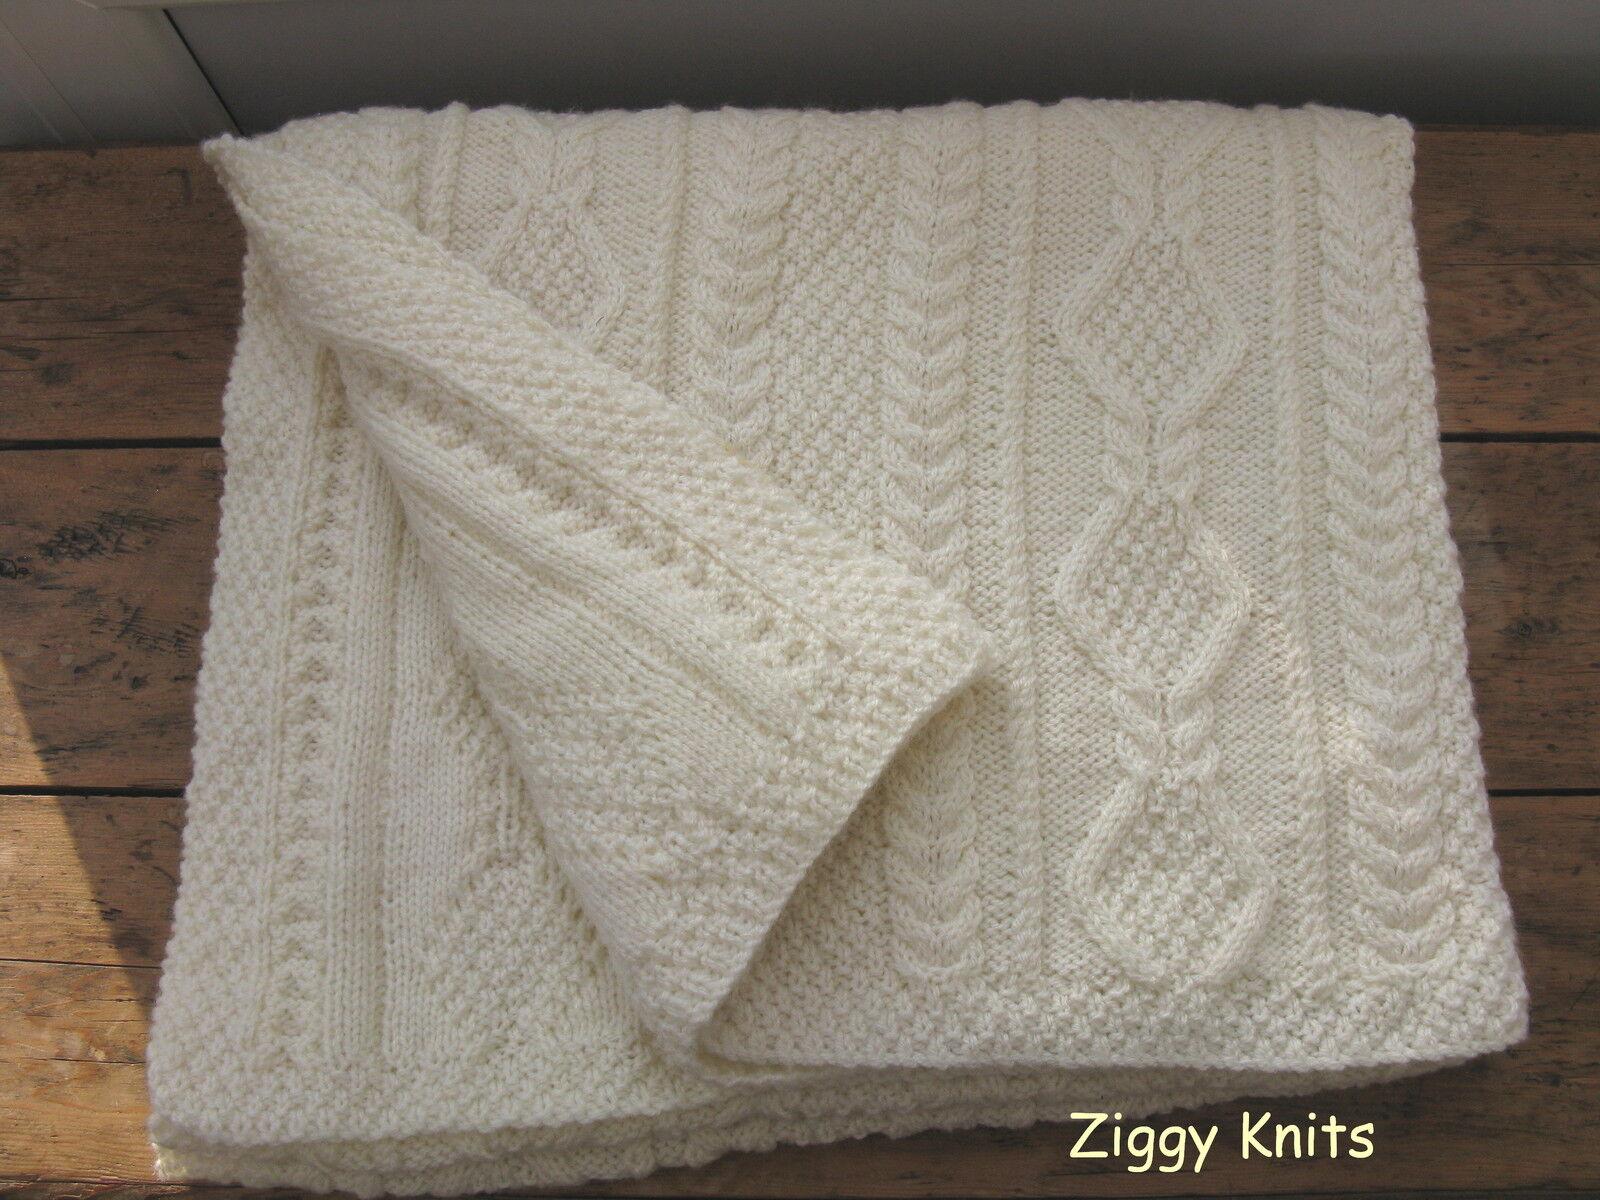 Ziggy Hand Knits